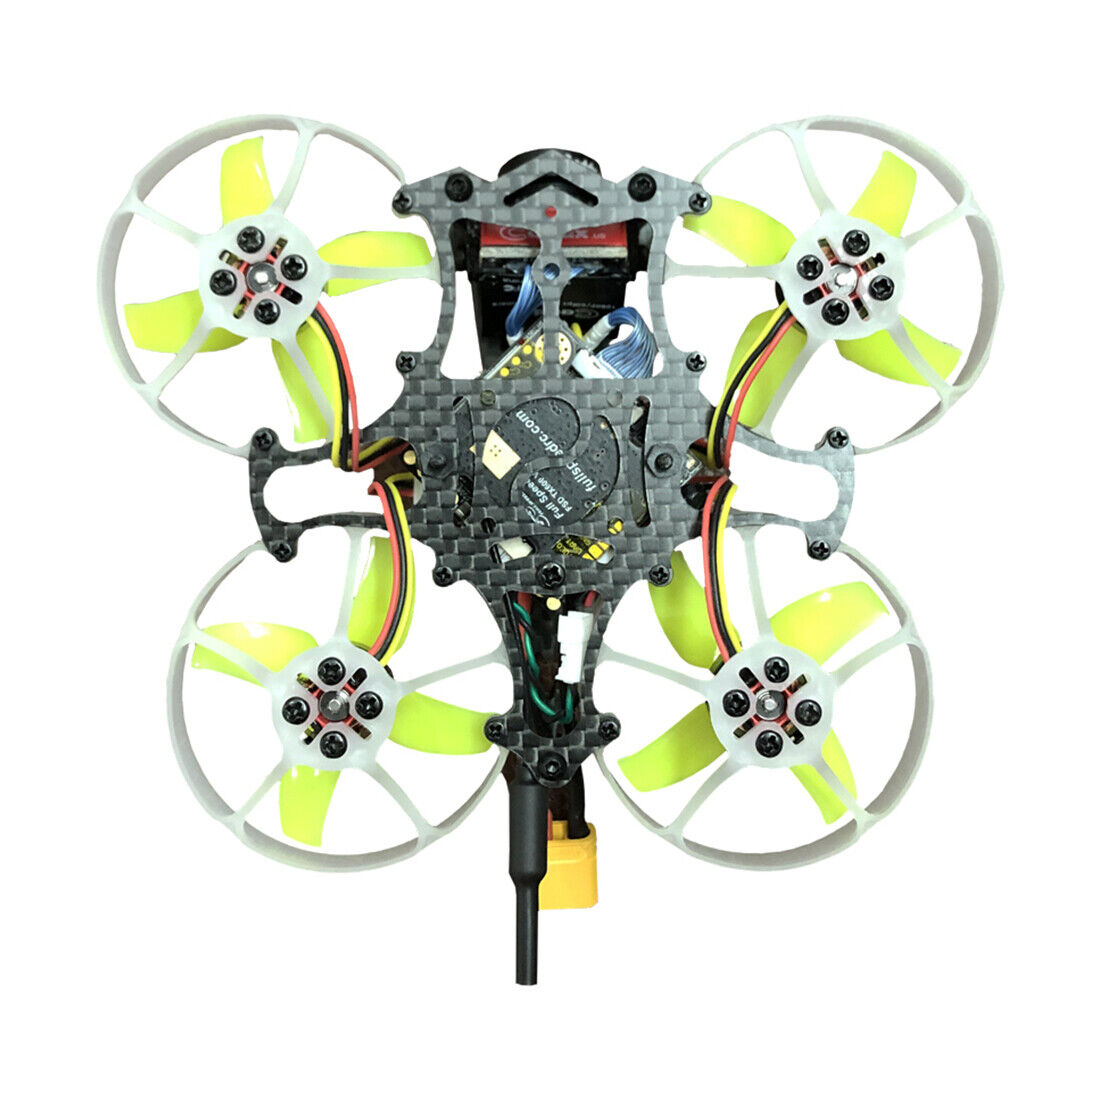 FULLSPEED tinyleader HDV2 sin escobillas dan por FPV RACING Drone 2-3S